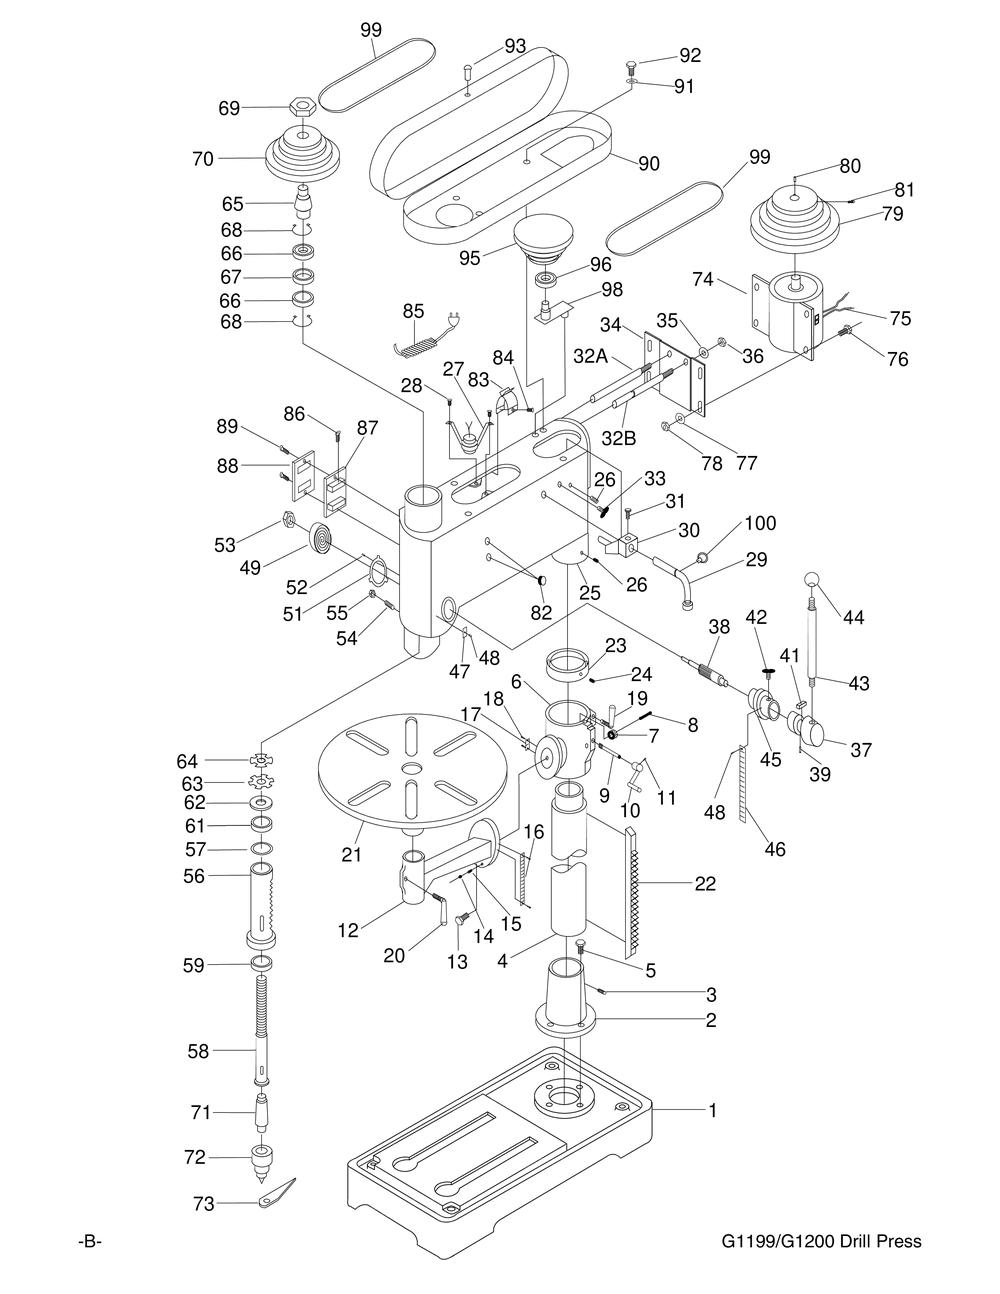 hight resolution of acdelco 27si alternator wiring diagram acdelco 3 wire gm 4 wire gm alternator wiring delco alternator wiring diagram